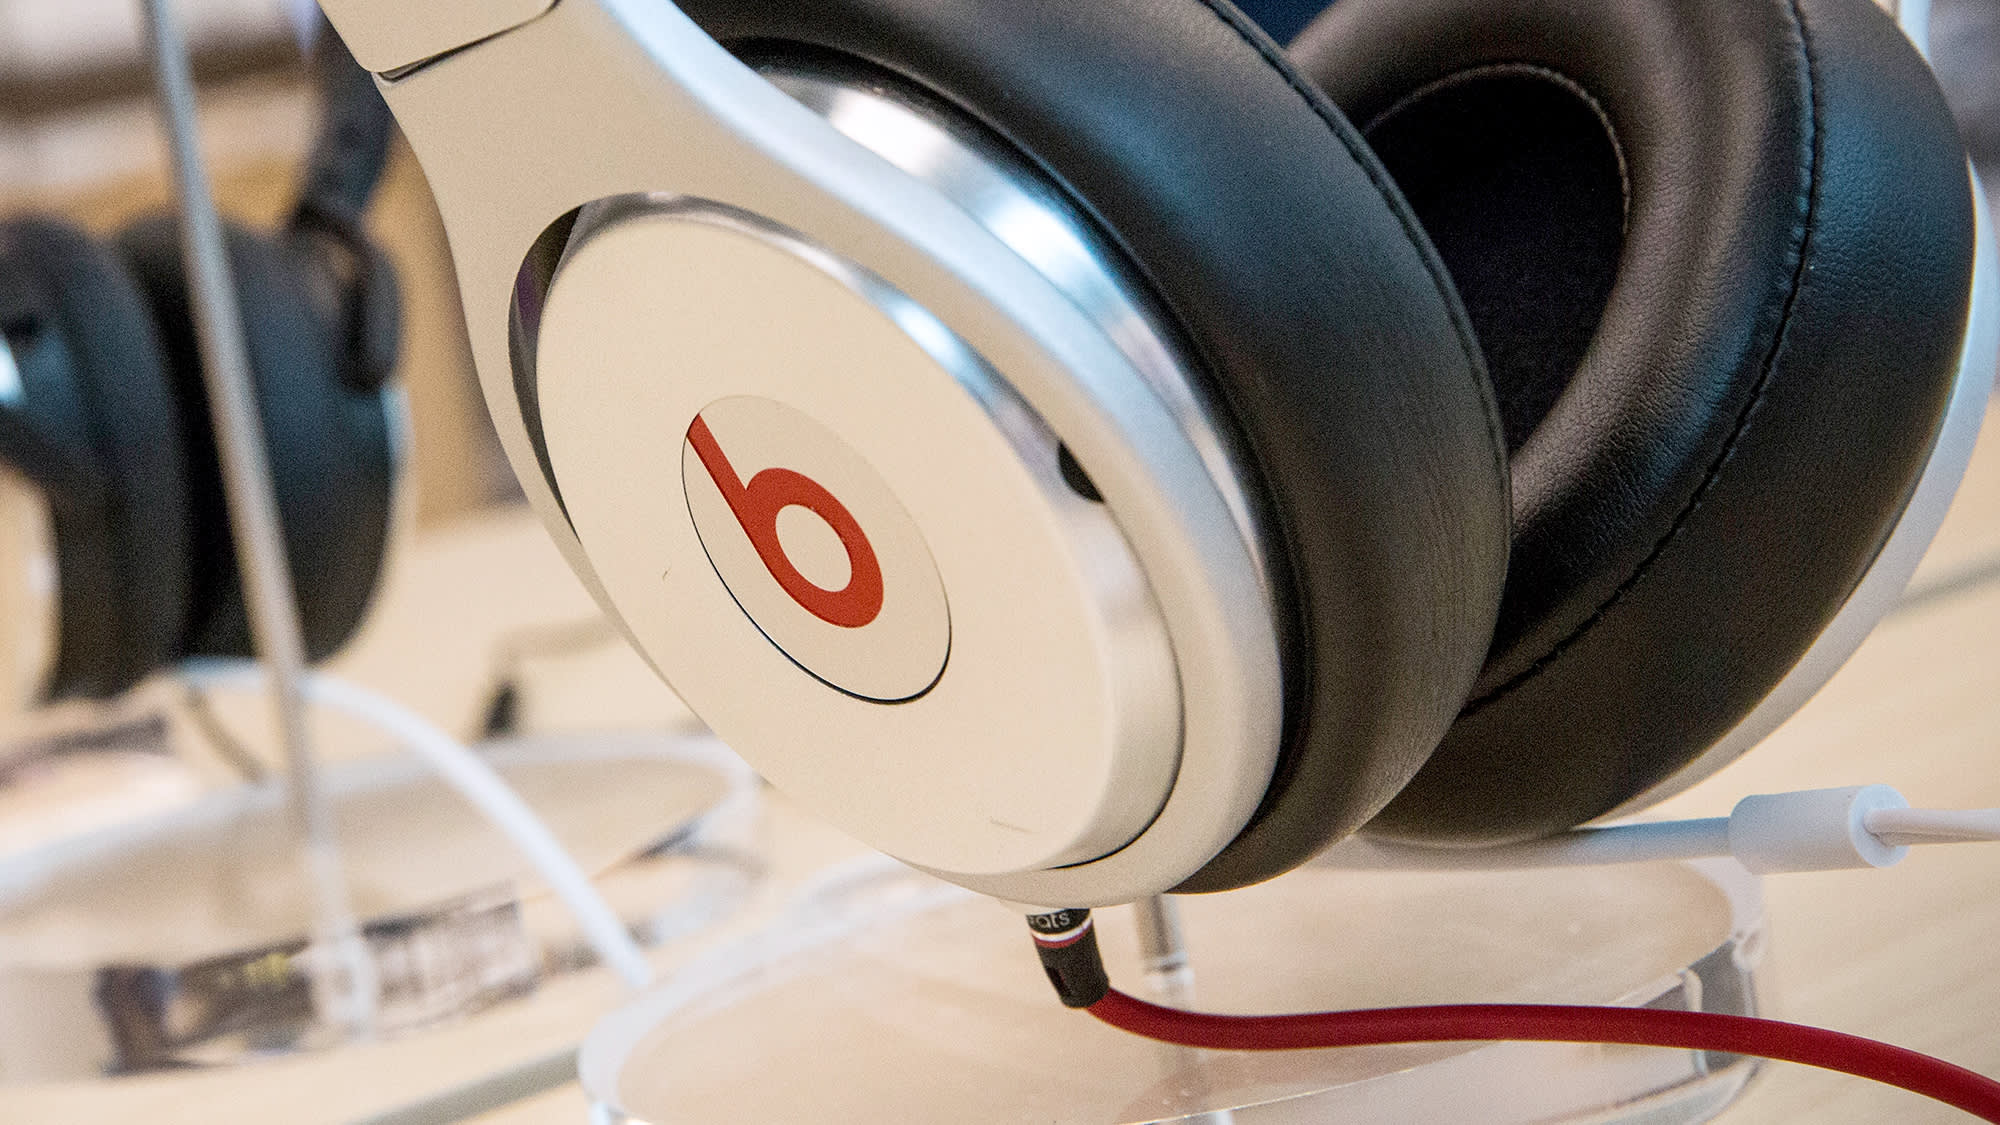 Apple to shut down Beats Music: Report